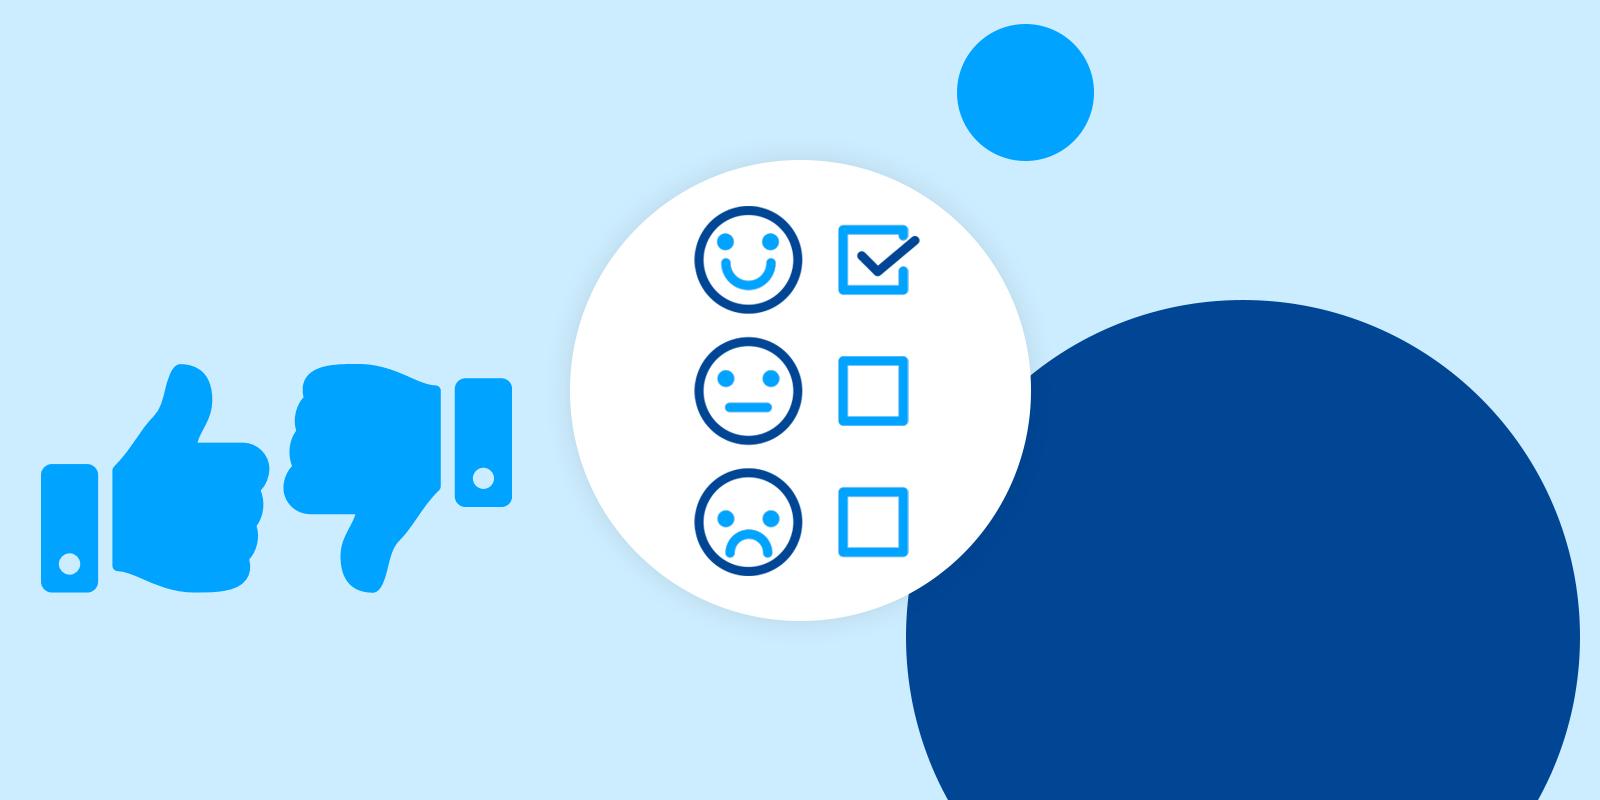 closing customer feedback loop by feedback type